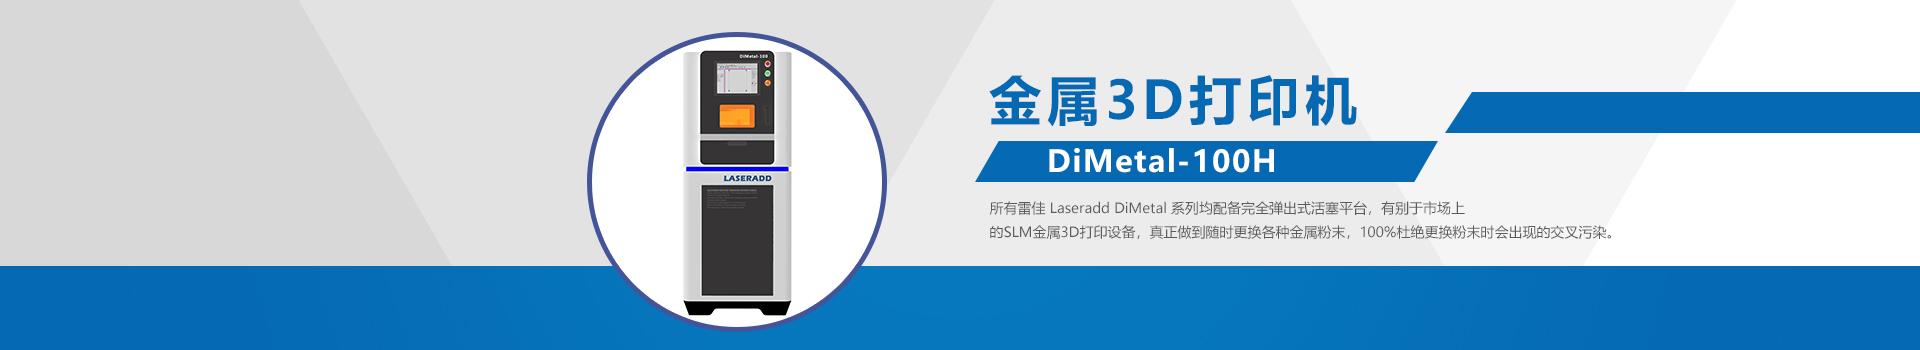 DiMetal-100H 金属3D打印机